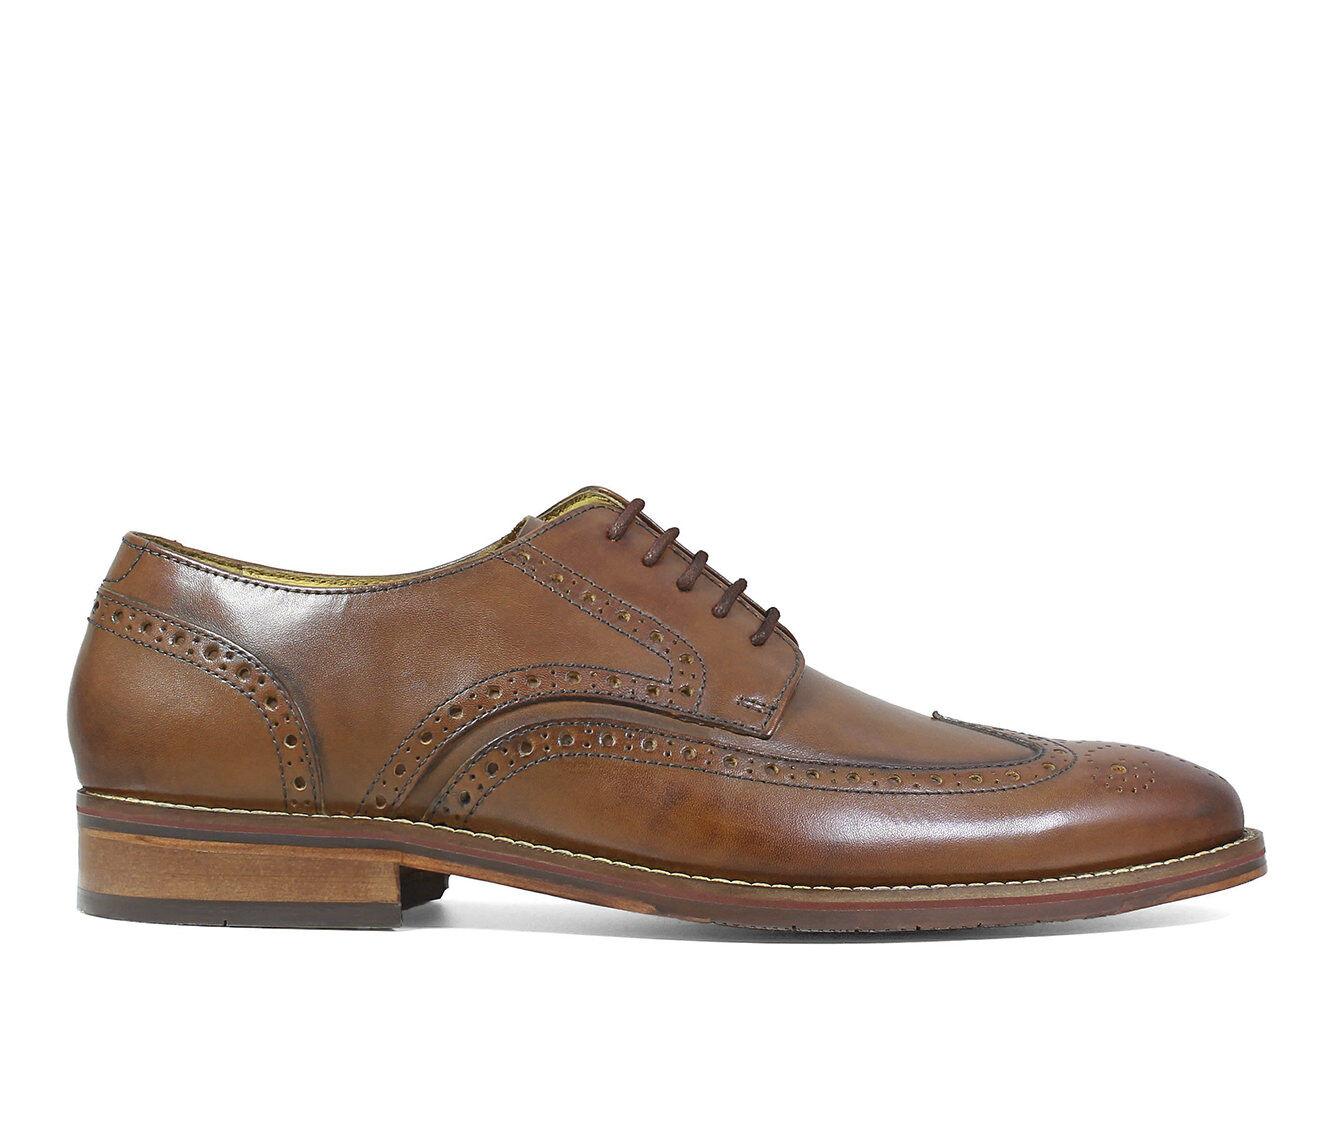 clearance price Men's Florsheim Salerno Wing Tip Oxford Dress Shoes Cognac